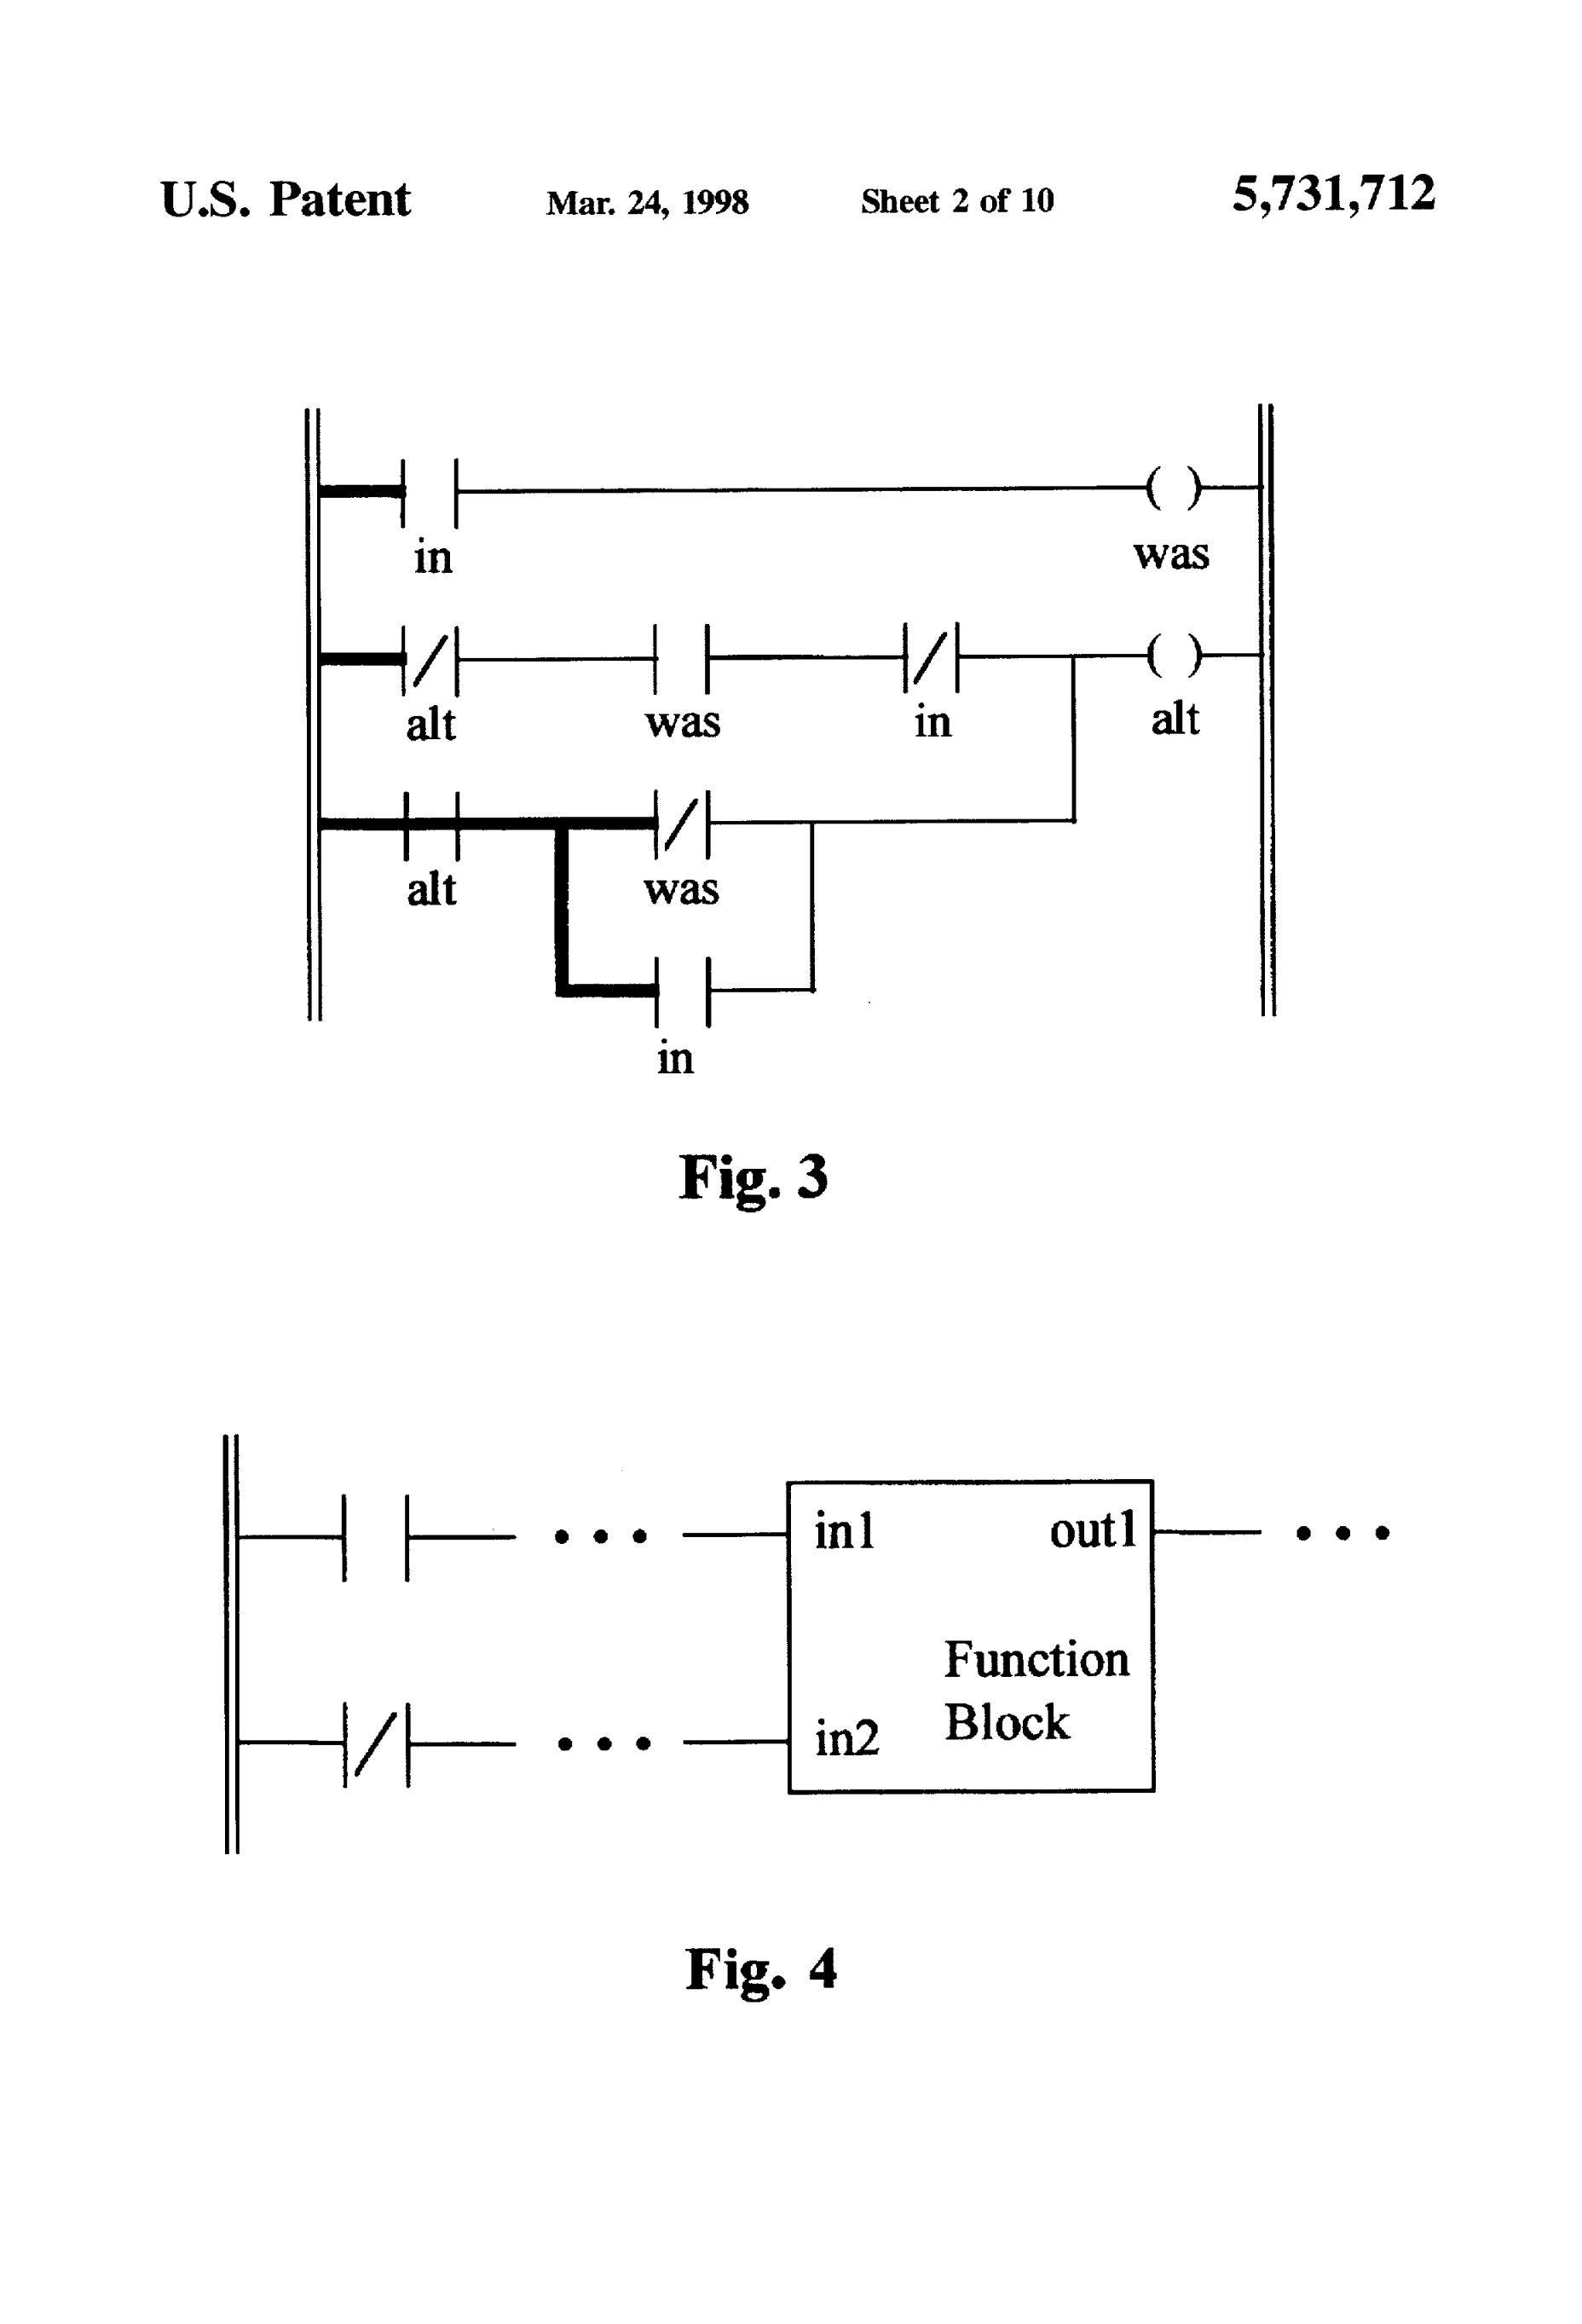 plc wiring diagram symbols - relay ladder wiring diagram valid new traffic  light plc ladder diagram